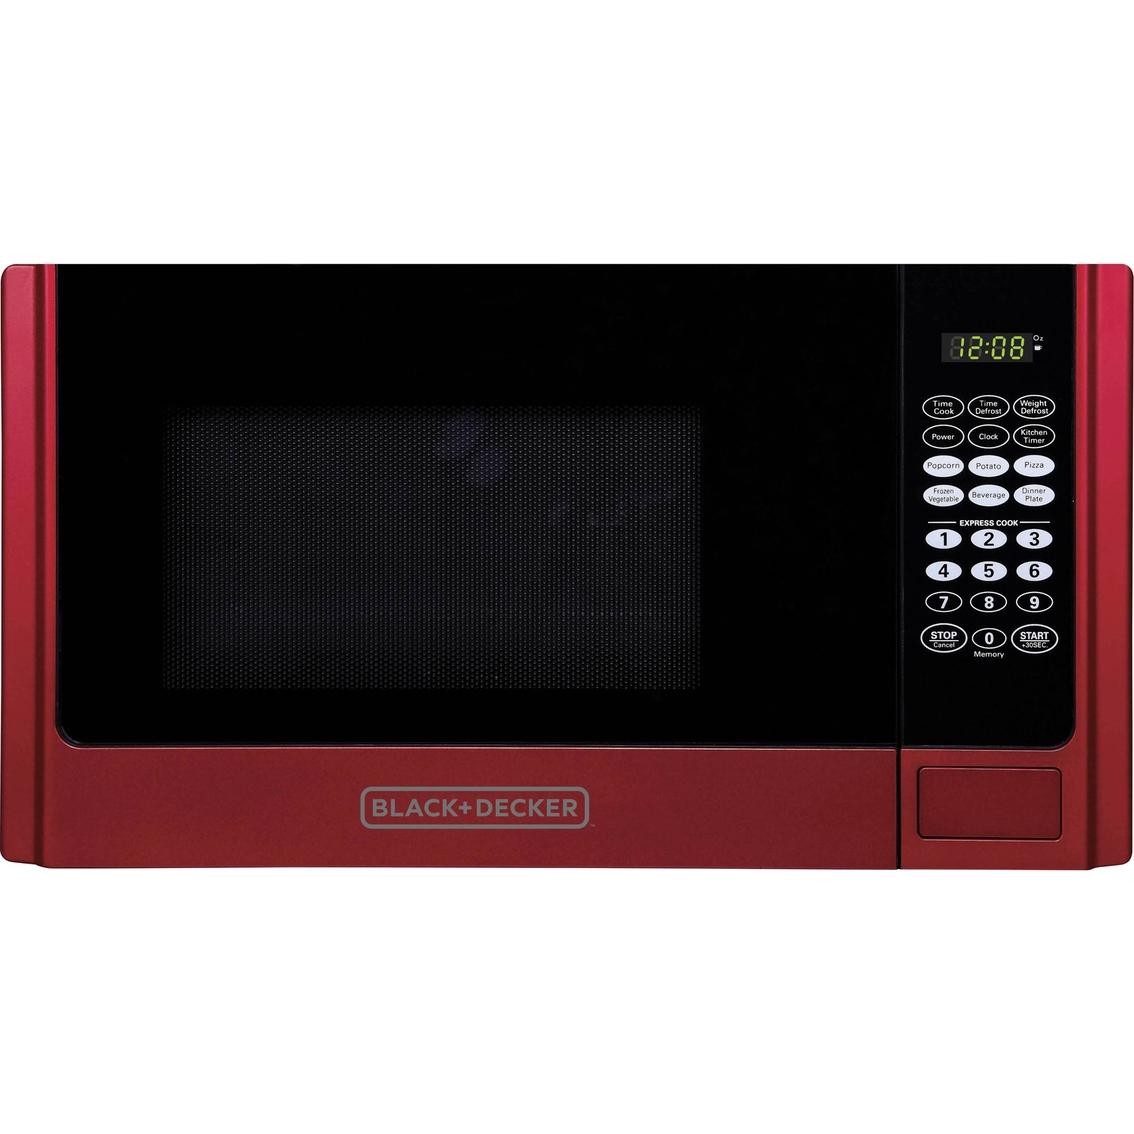 Black Decker 0 9 Cu Ft Microwave Oven